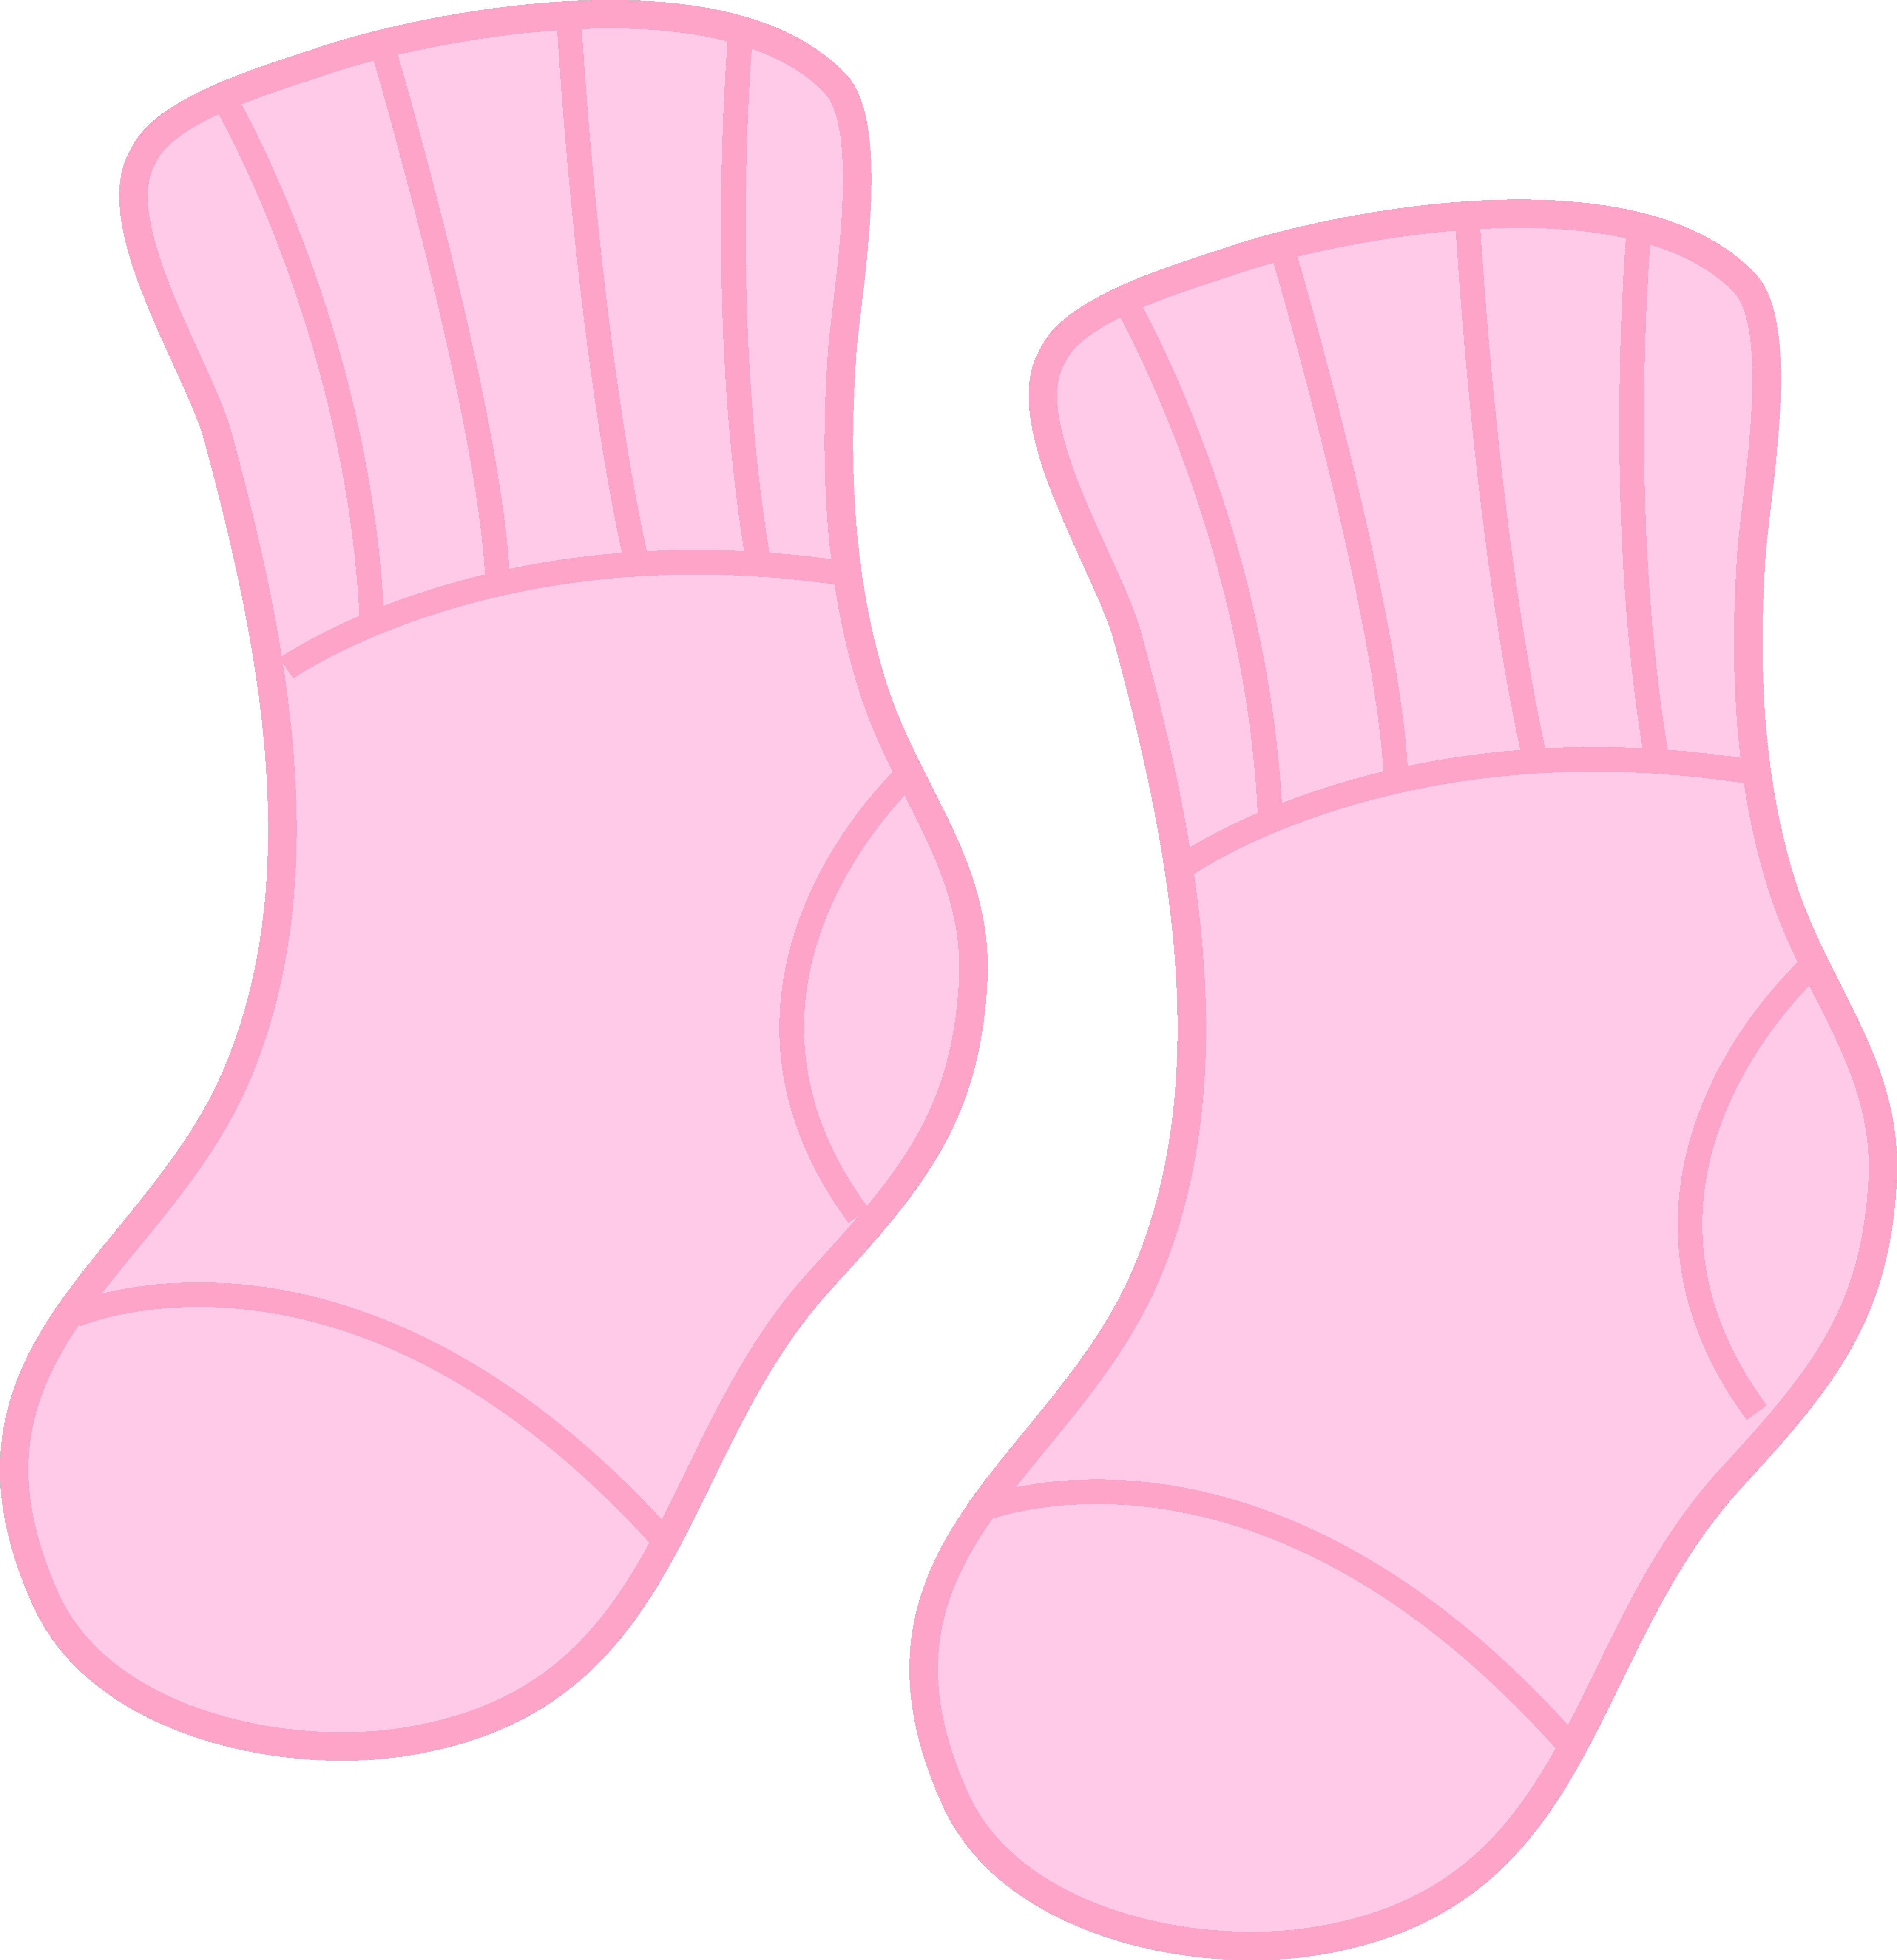 4462x4611 Baby Feet Baby Girl Footprint Clipart Free Download Clip Art 2